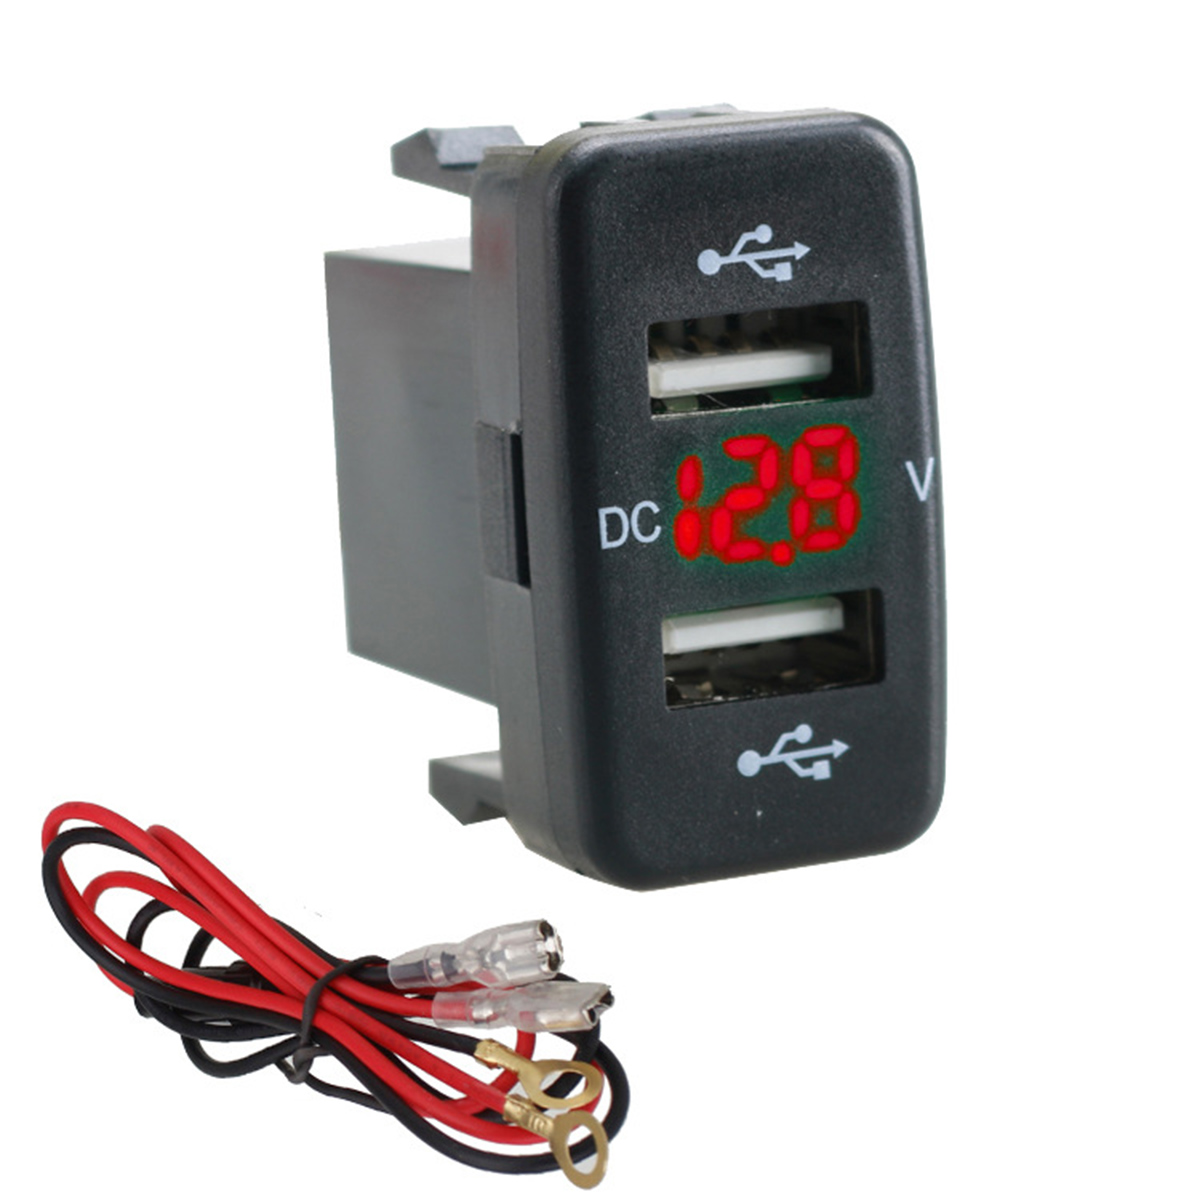 12V-24V Car 4.2A Dual USB Ports Socket Charger Voltmeter Power Socket for Toyota12V-24V Car 4.2A Dual USB Ports Socket Charger Voltmeter Power Socket for Toyota